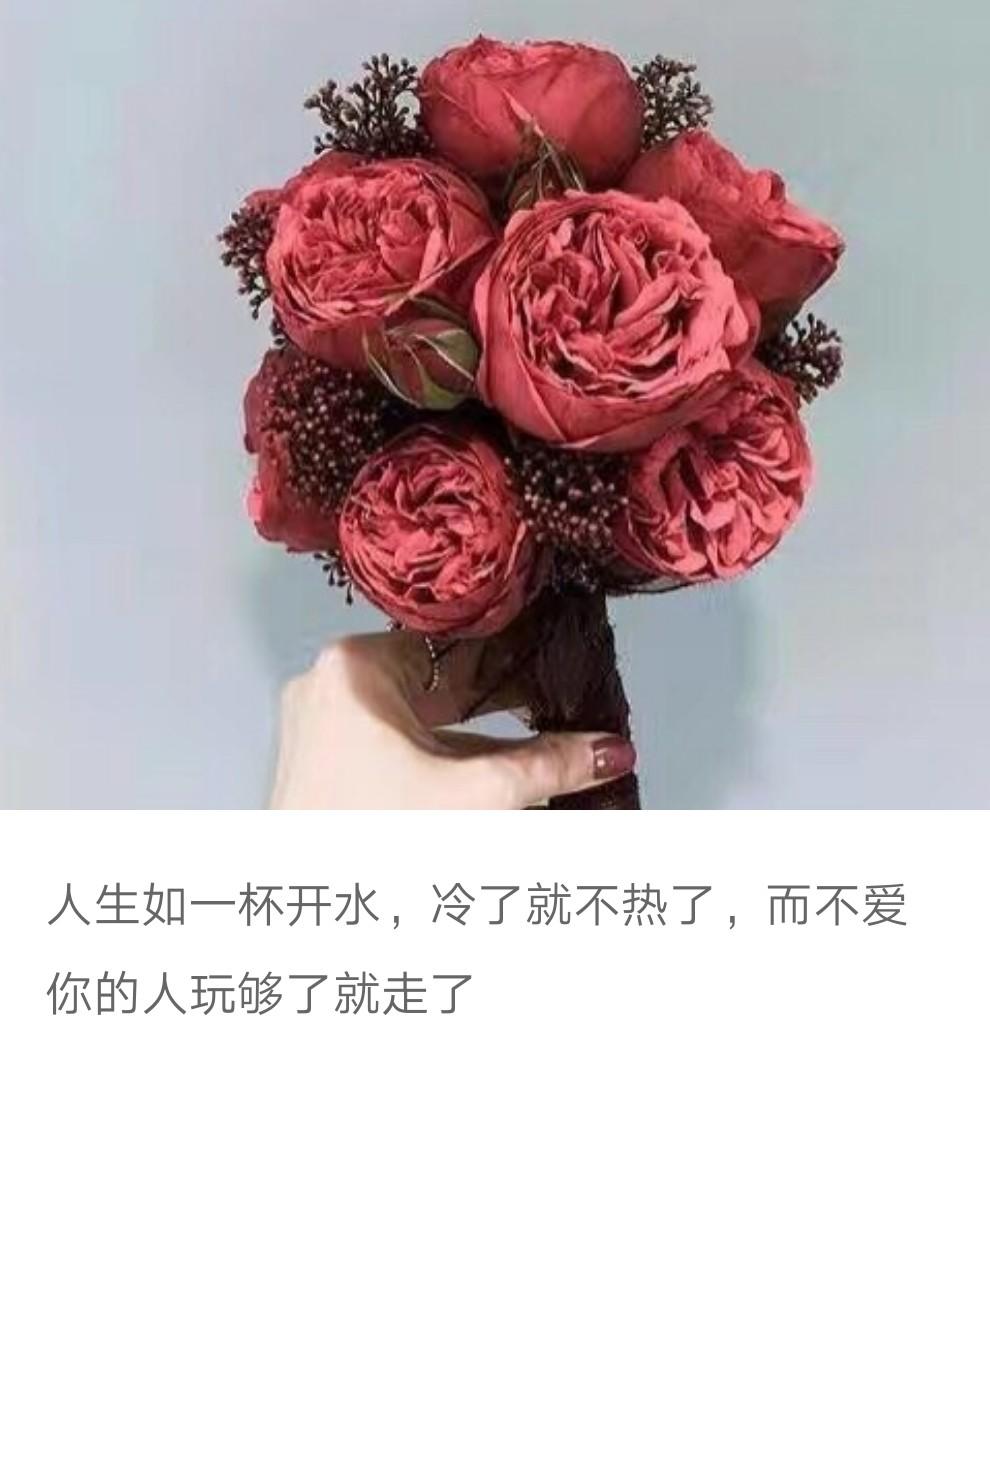 http://www.58100.com/pid/633649.html